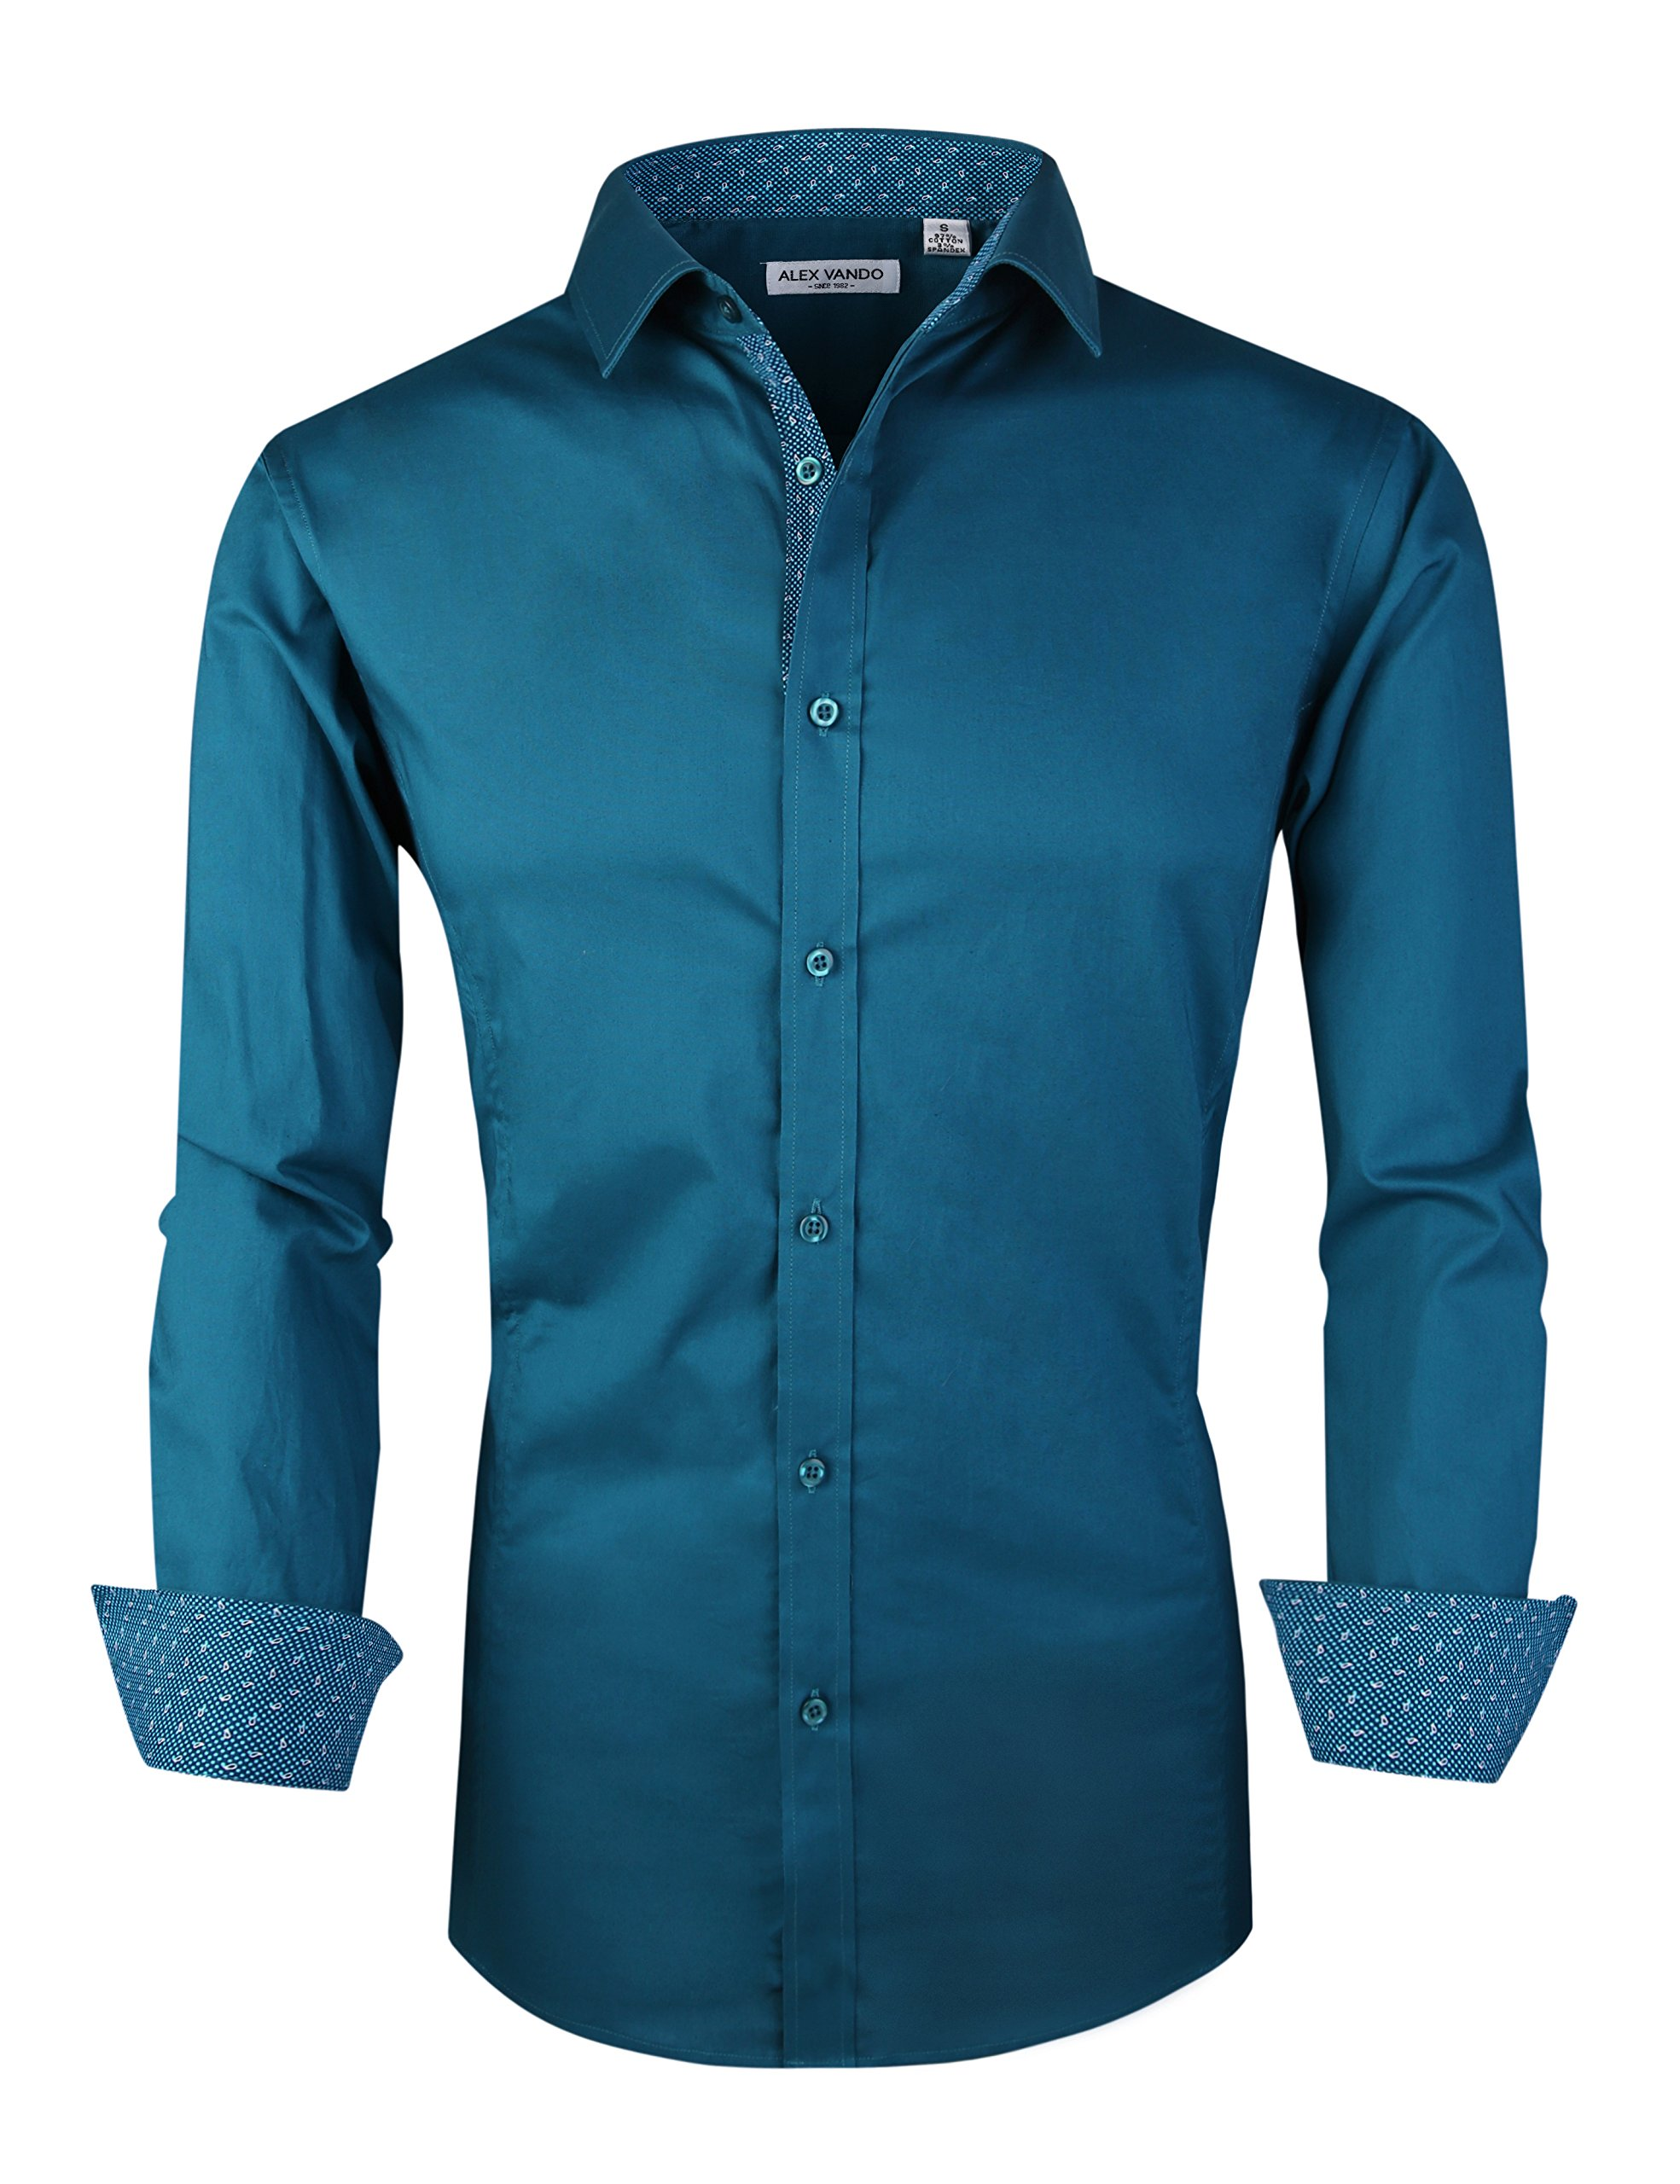 Joey CV Mens Casual Button Down Shirts Long Sleeve Regular Fit(Teal,XXLarge)